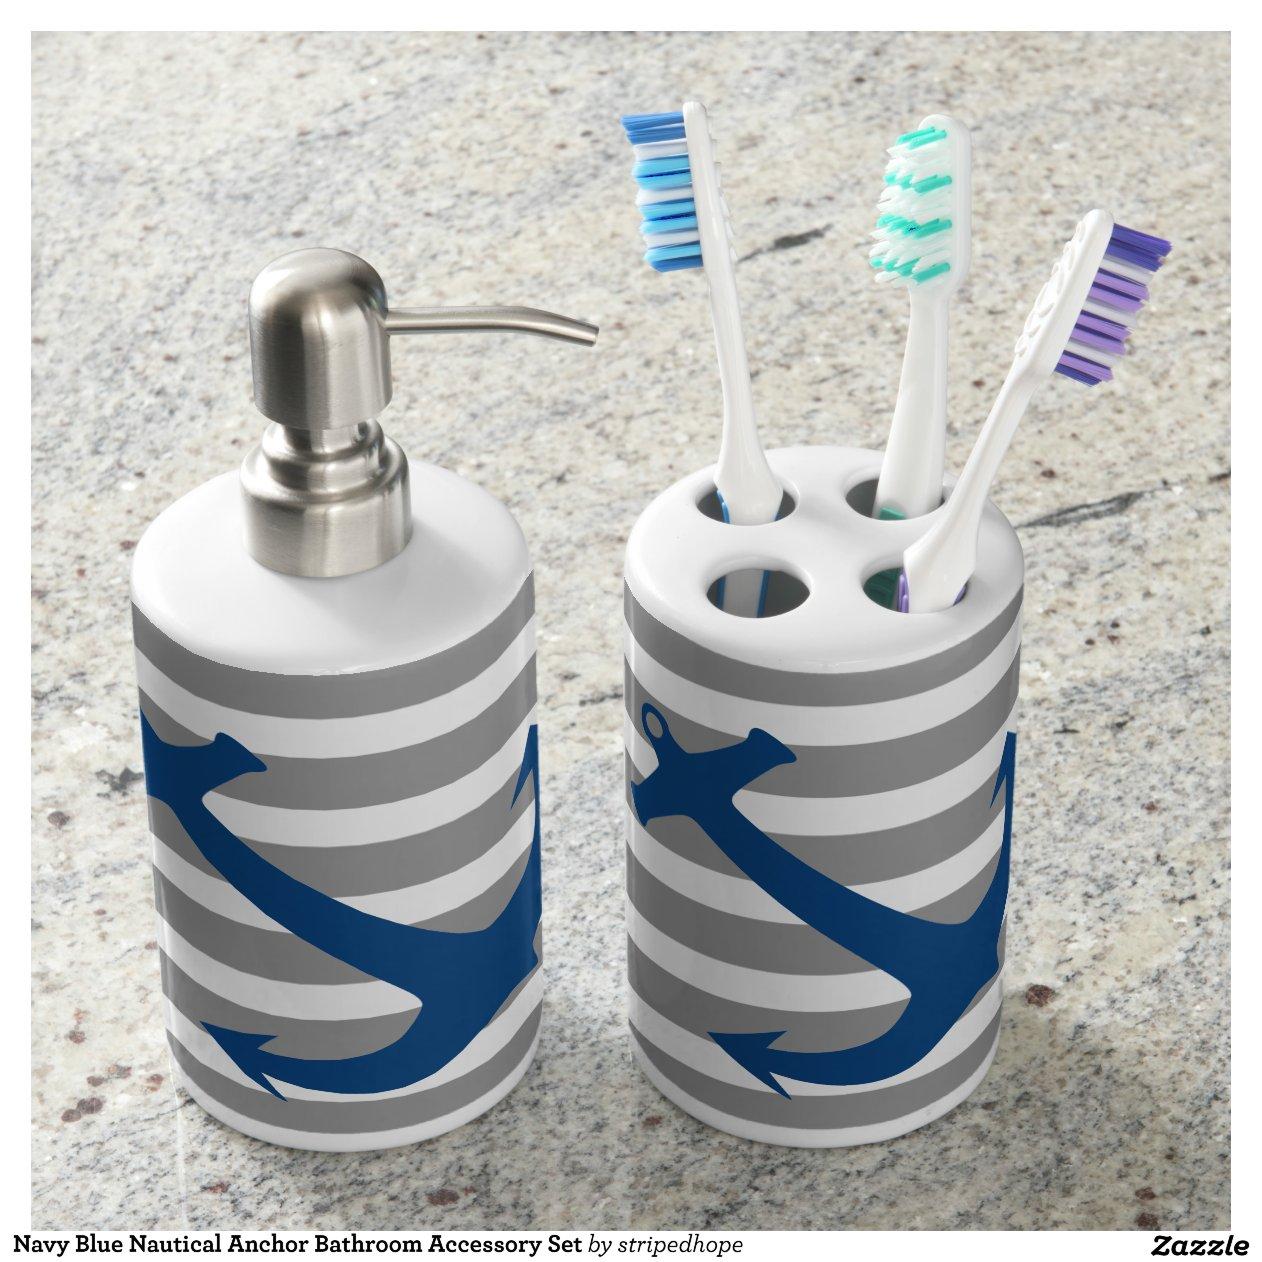 Lighthouse Nautical Bathroom Accessories: Navy Blue Nautical Anchor Bathroom Accessory Set Bath Sets